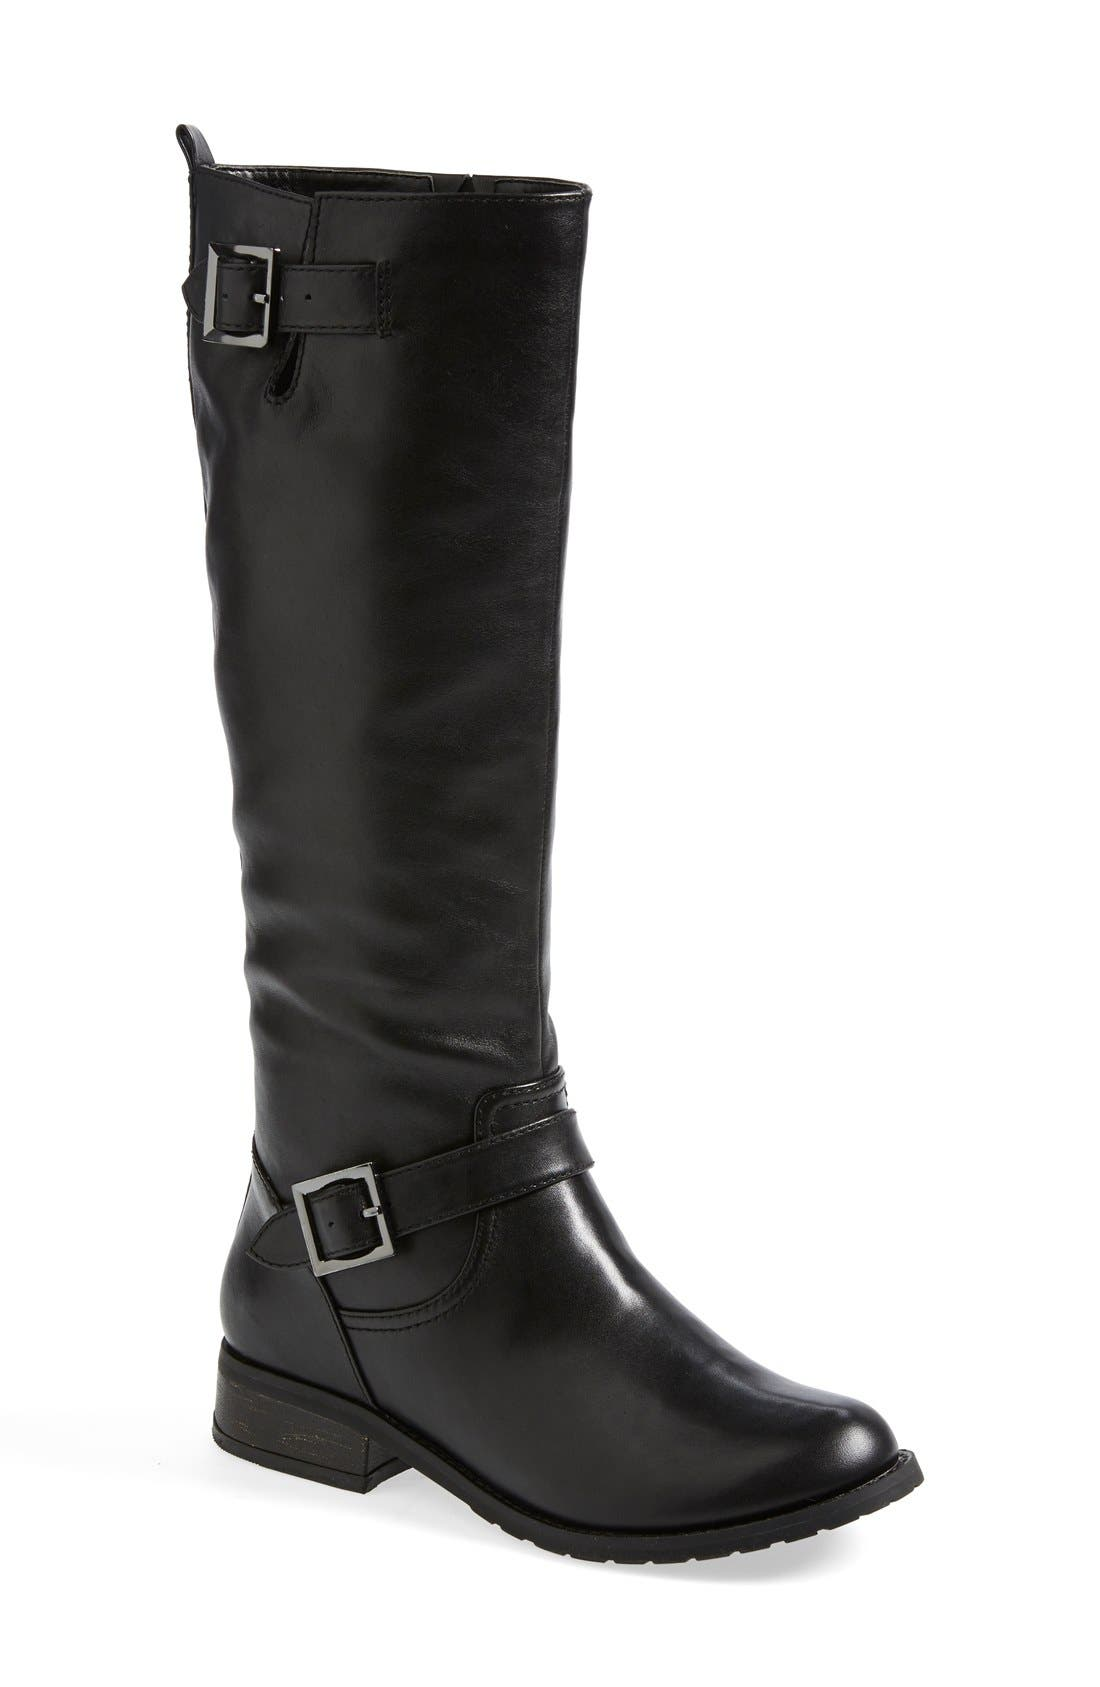 Alternate Image 1 Selected - BP. 'Burton' Moto Boot (Women)